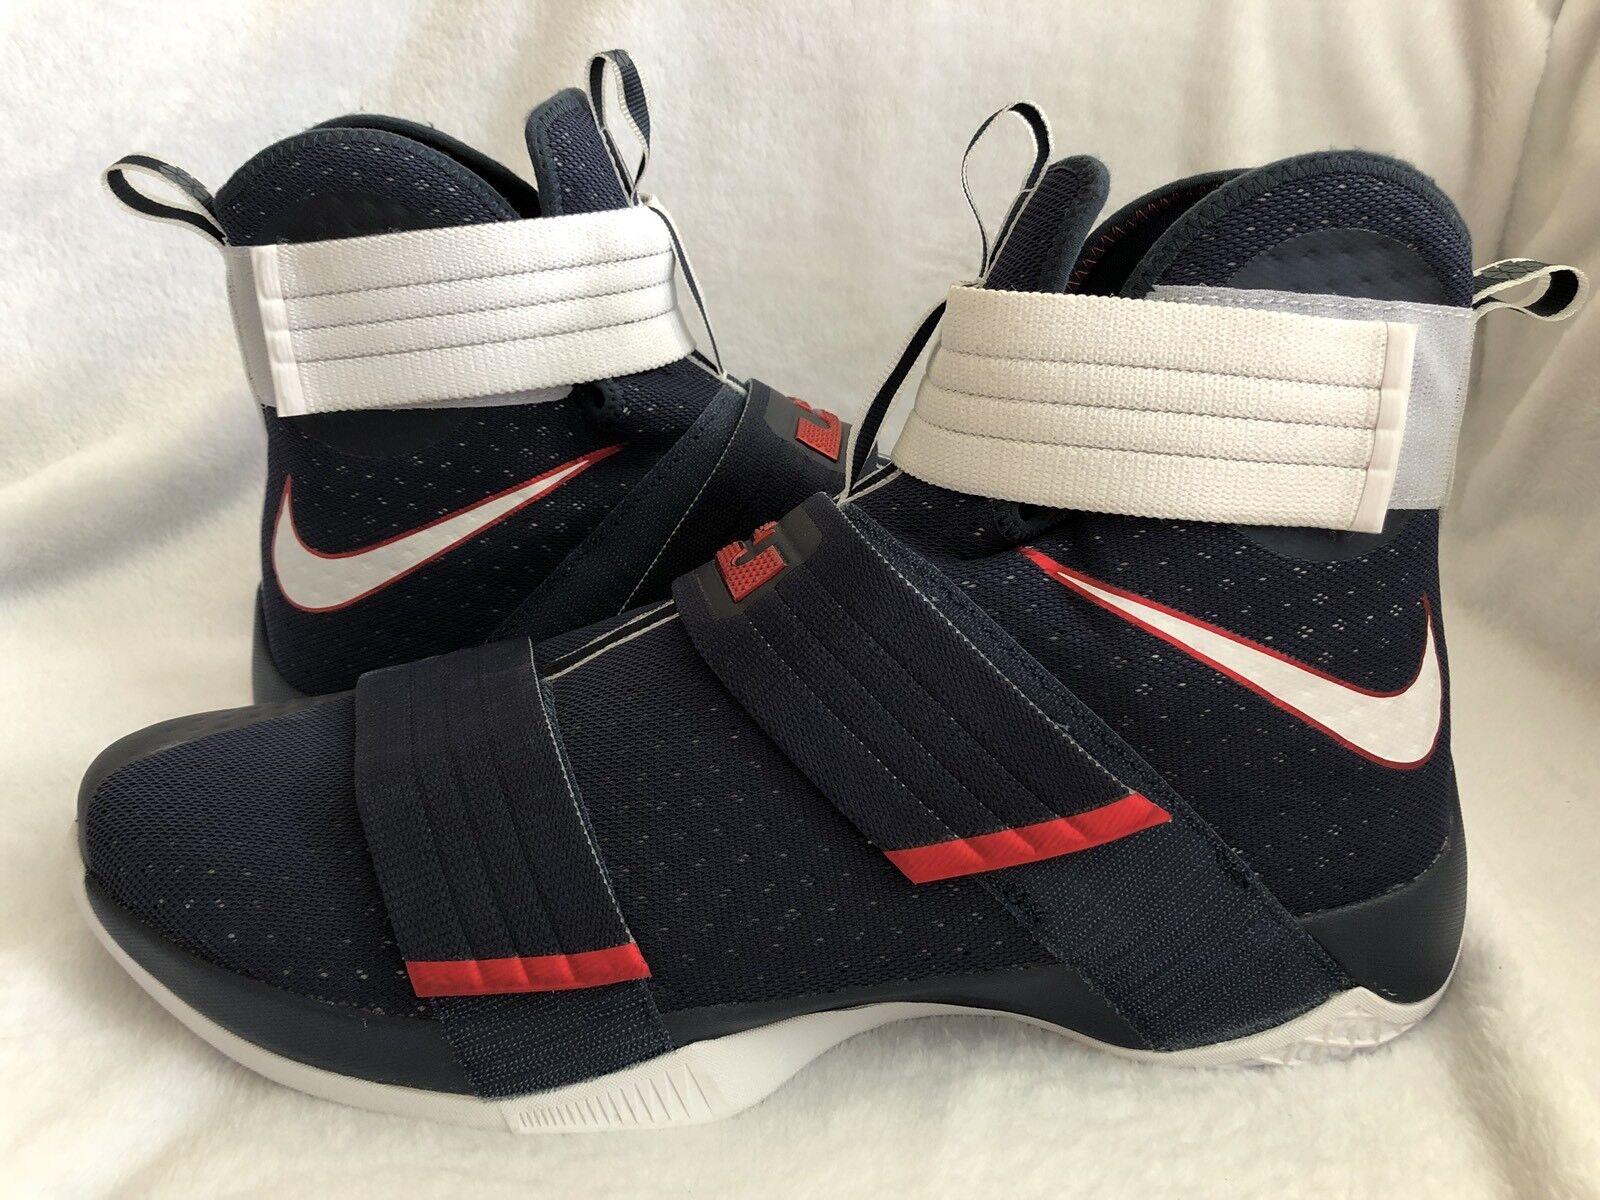 Nike LeBron Soldier X 10 SFG USA Olympics Obsidian/White 844378 416 Size 18 US